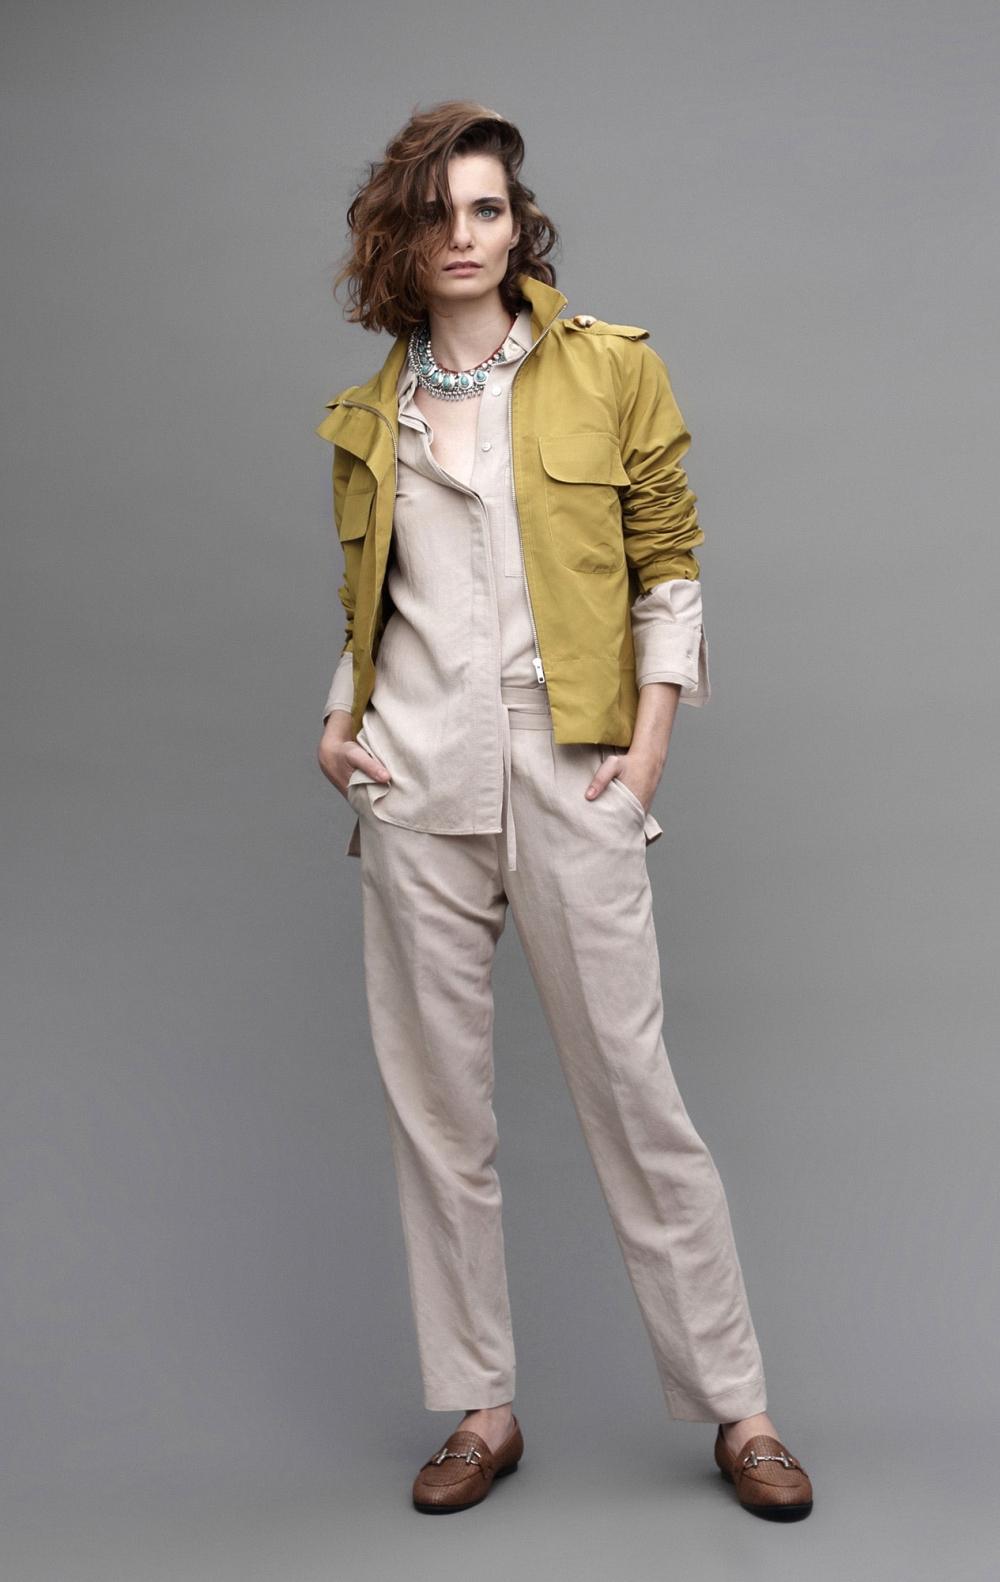 Jaqueta Valentina Dourada - Foto 2